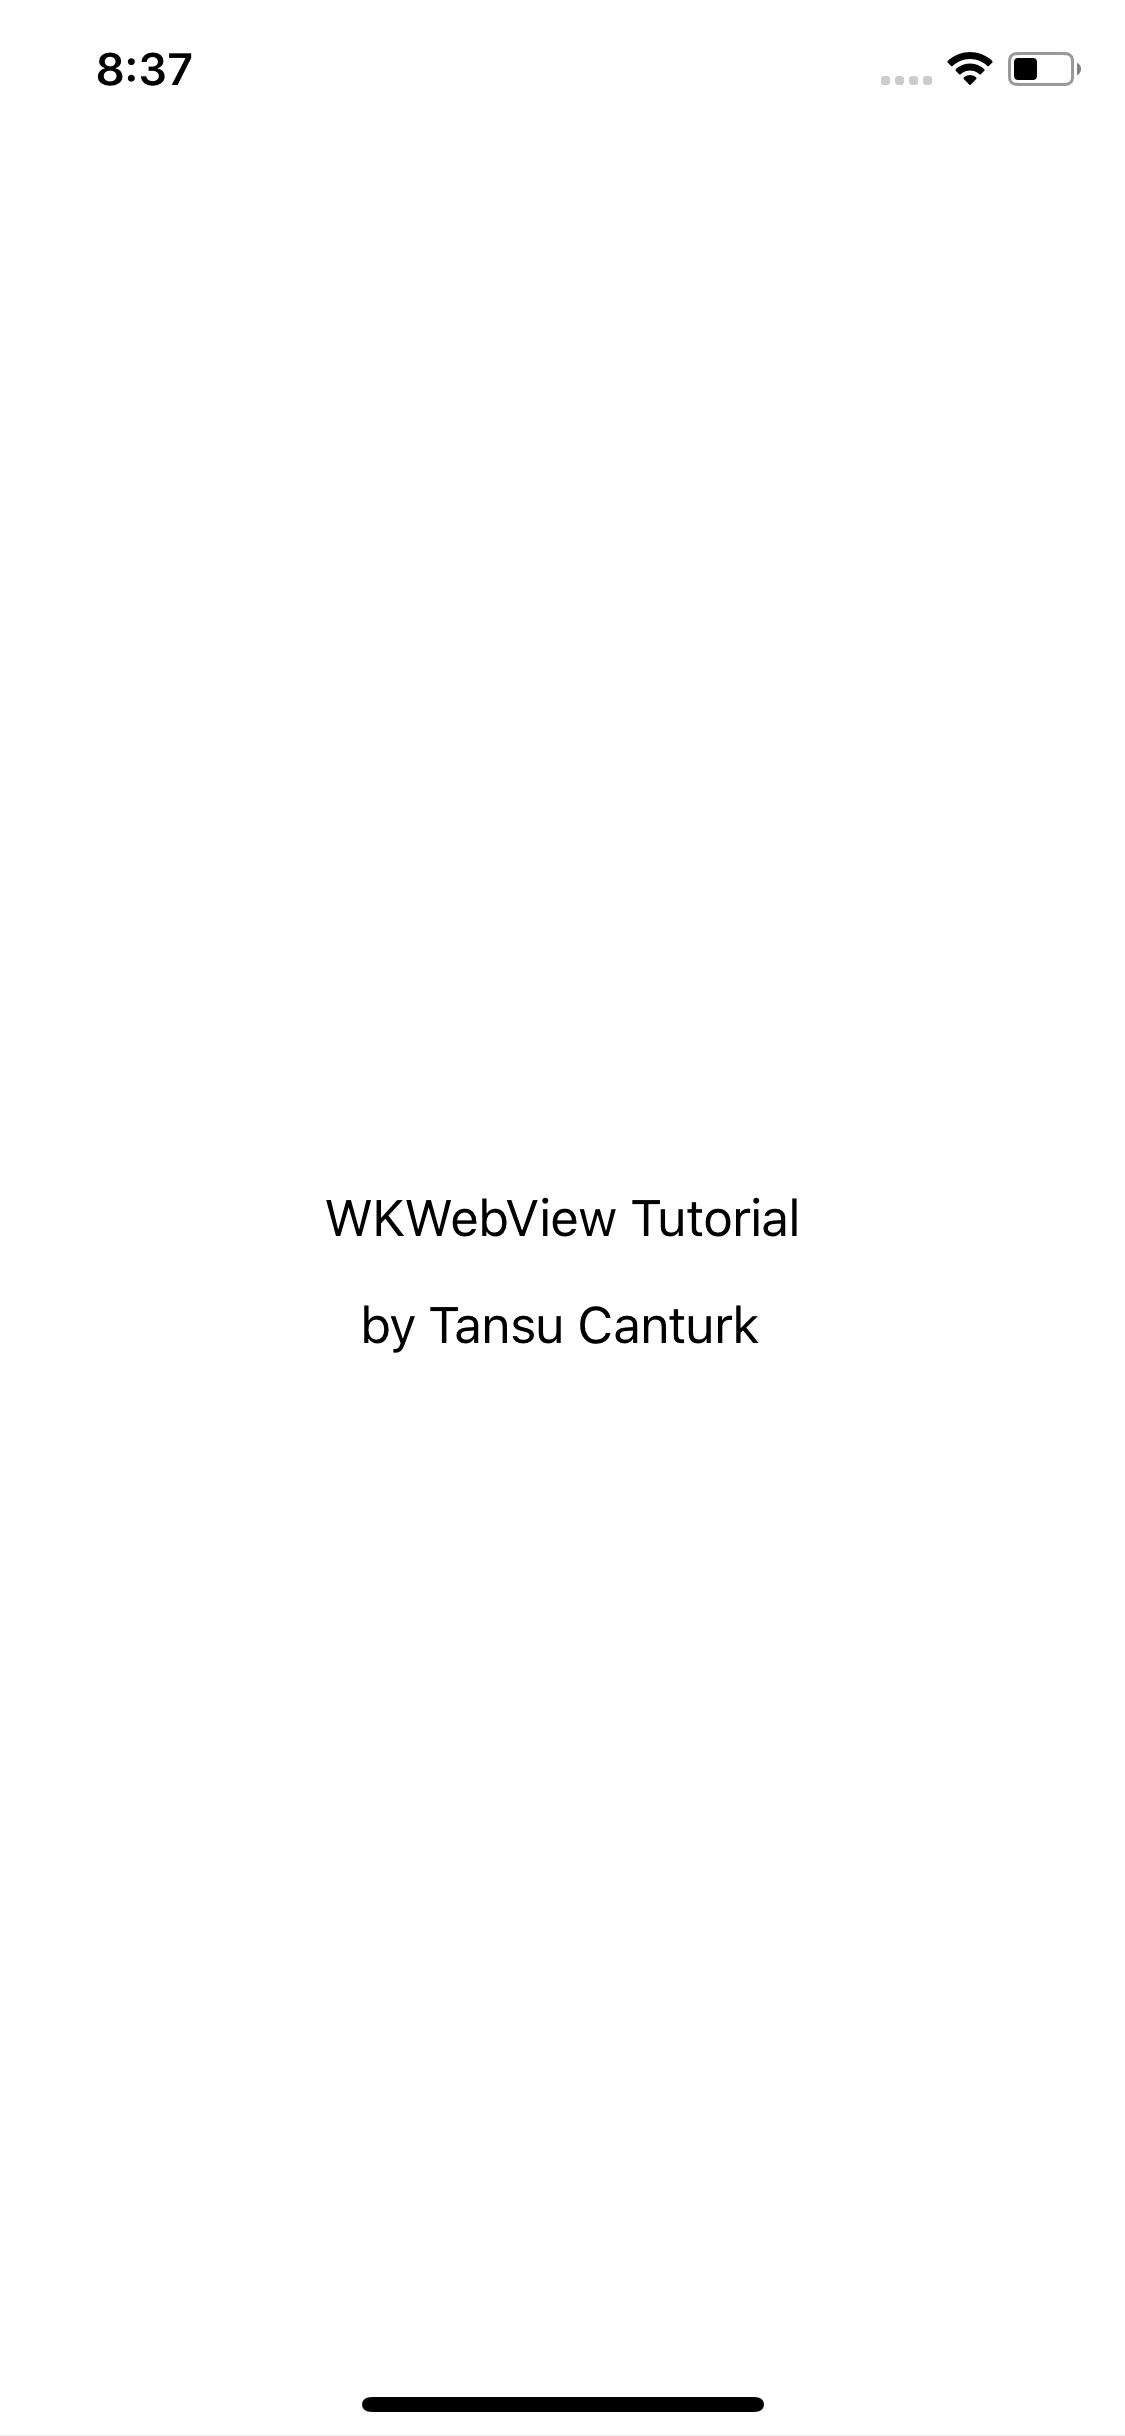 iOS Swift 4 WKWebview - Detect tel, mailto, target=